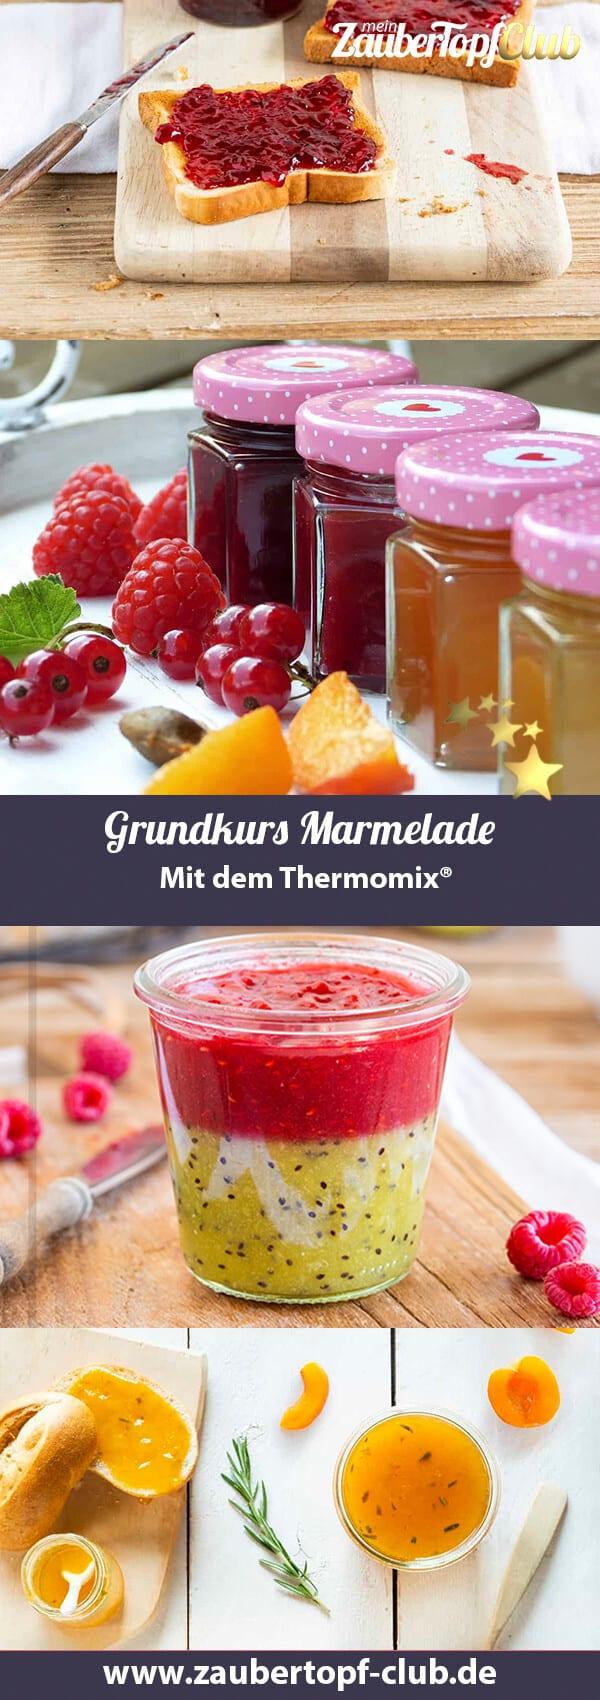 Marmelade aus dem Thermomix® – Fotos: Anna Gieseler, Pixabay